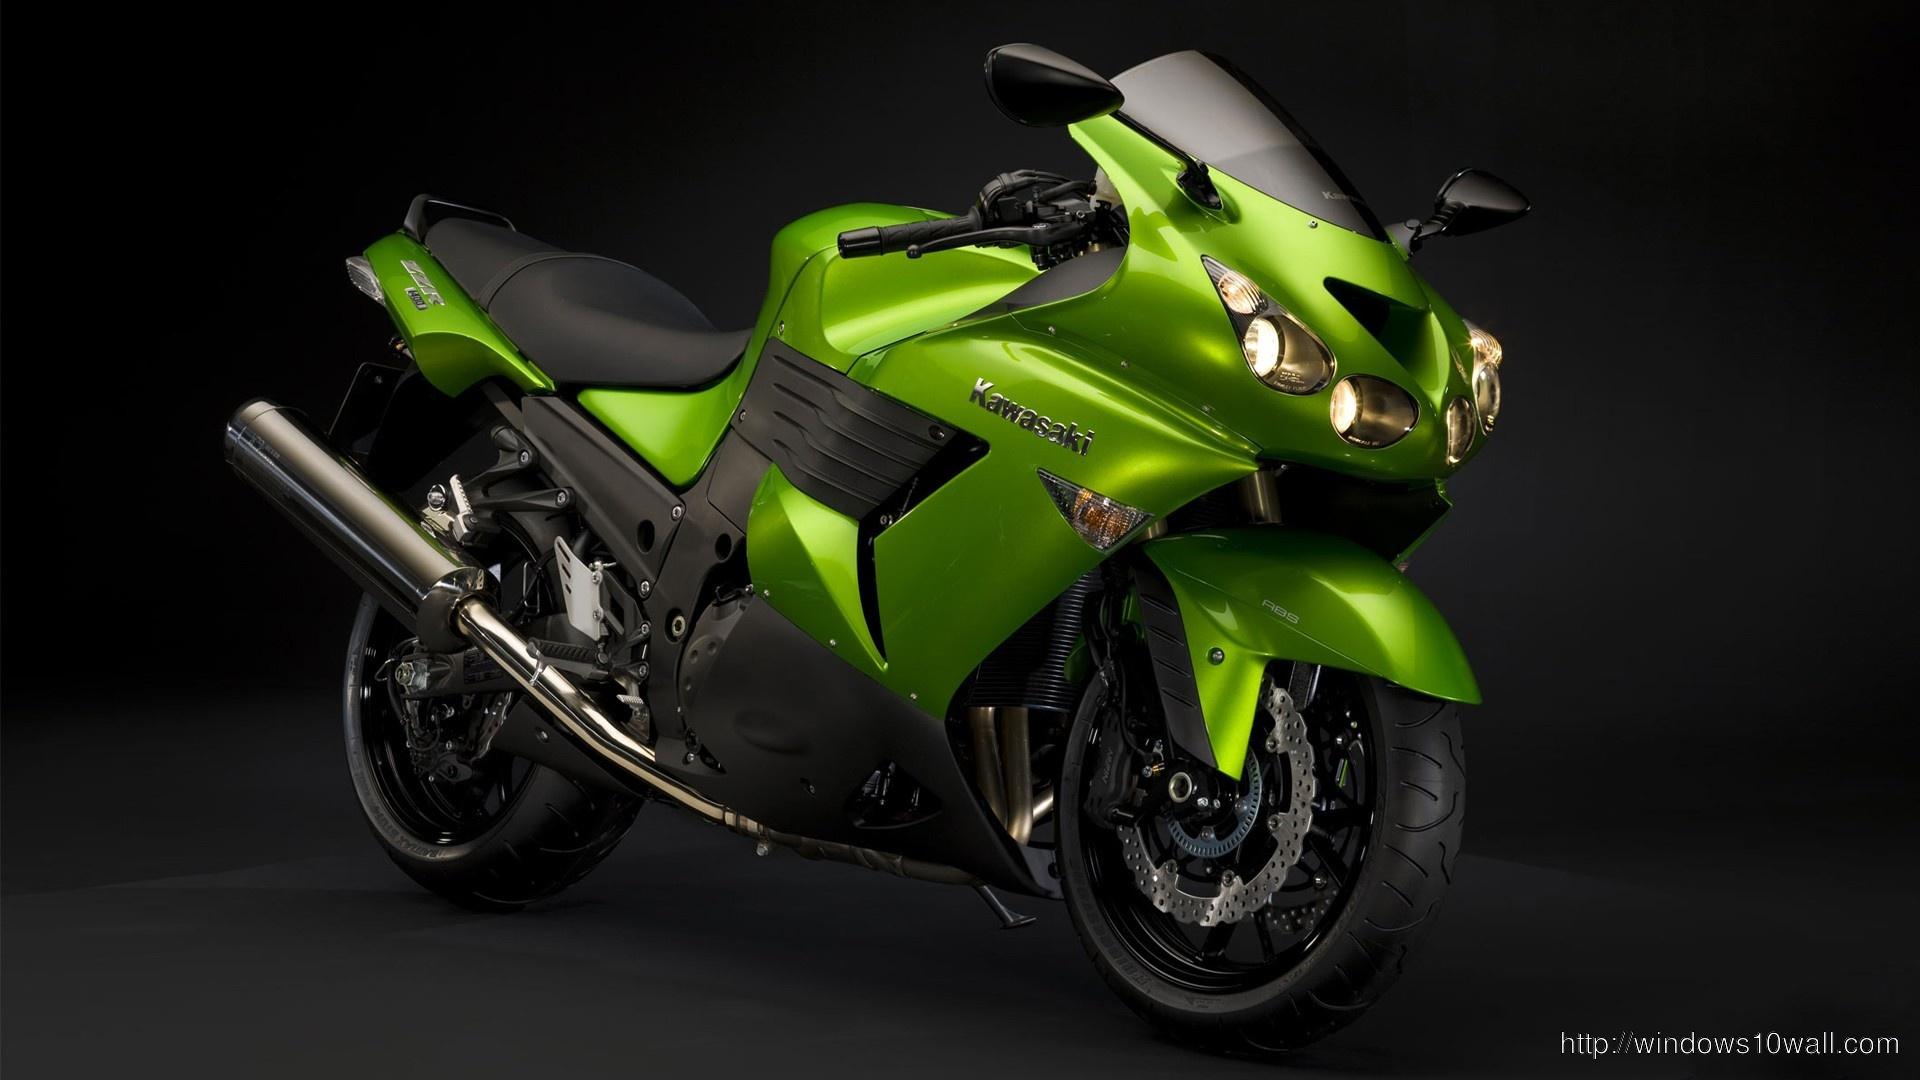 Kawasaki Abs Bike Windows 10 Wallpapers